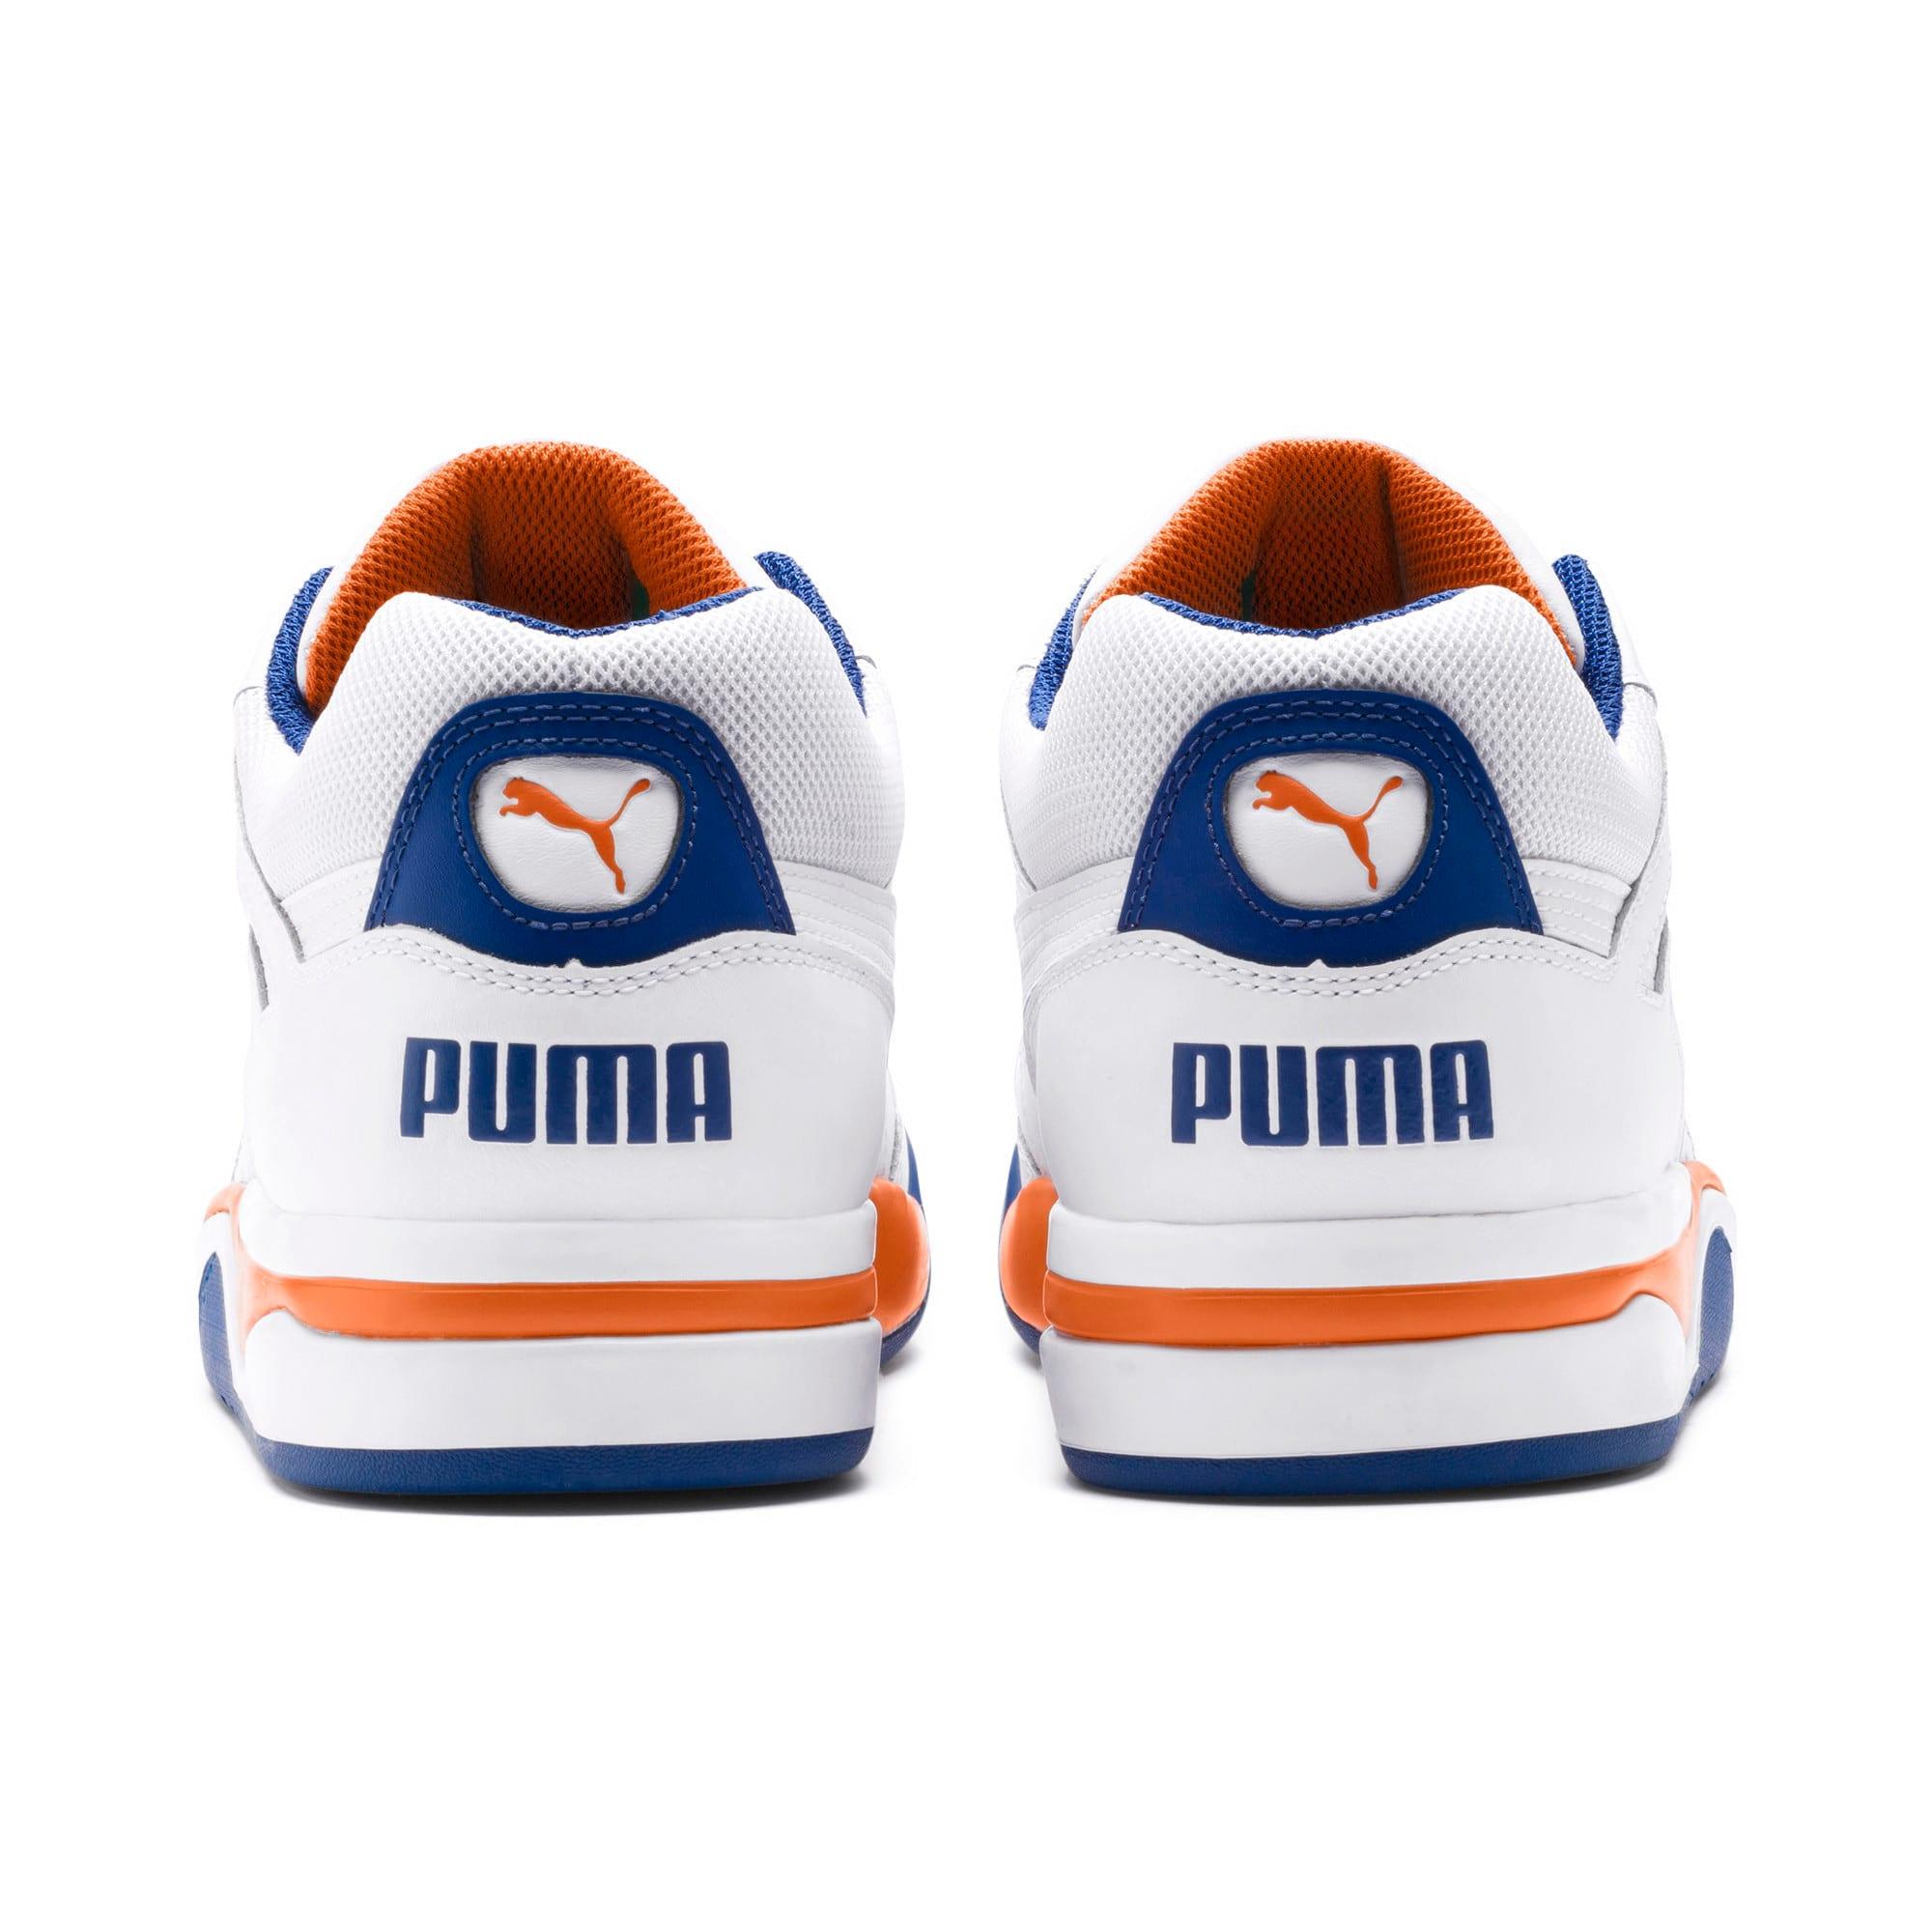 Thumbnail 3 of Palace Guard Sneakers, P White-Jaffa Orange-G Blue, medium